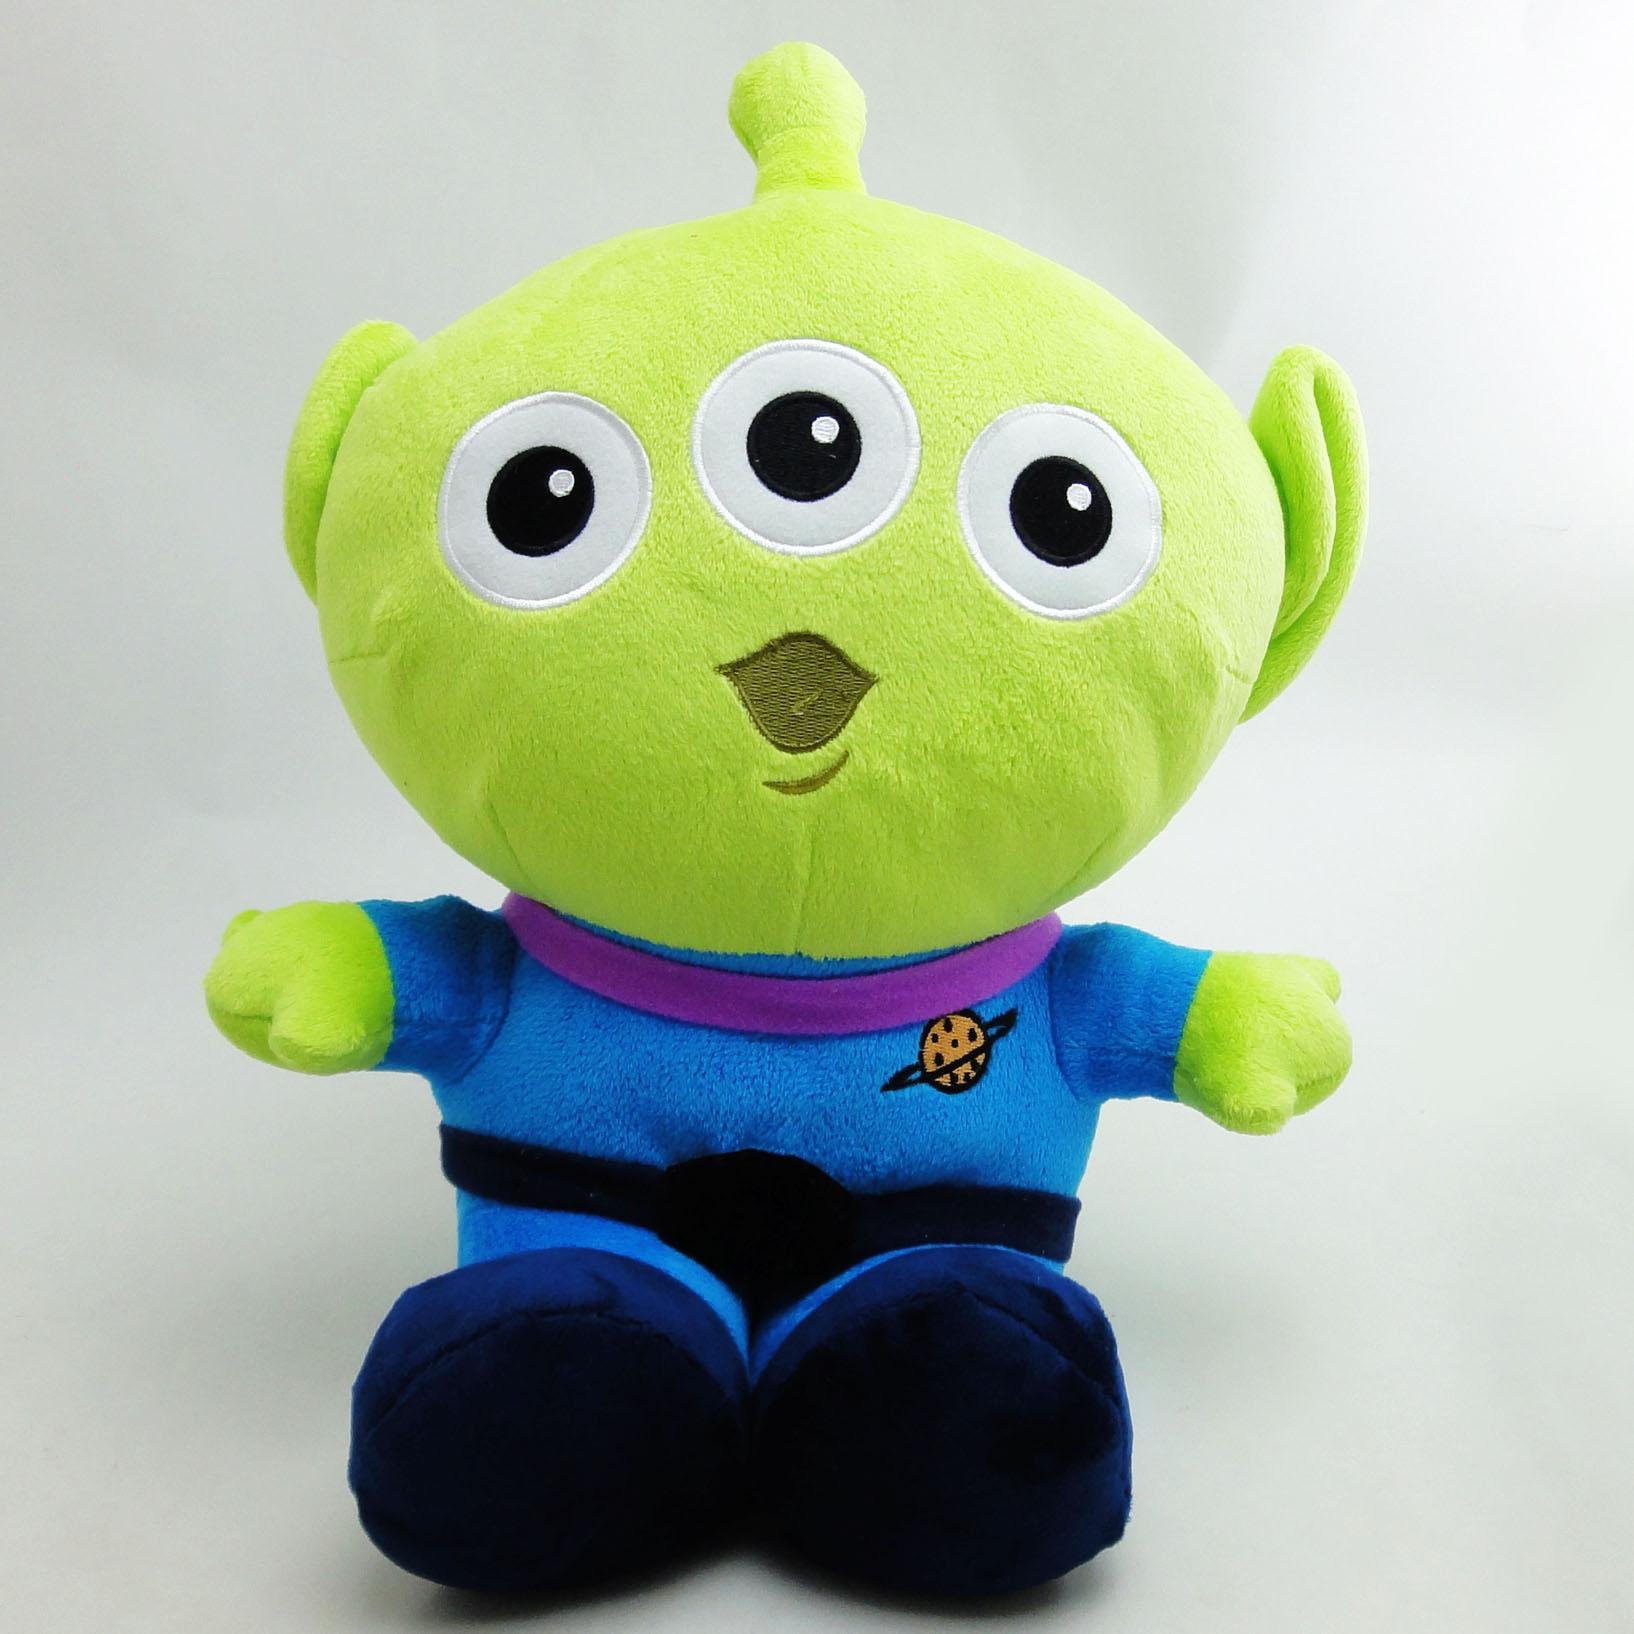 【UNIPRO】迪士尼正版 三眼怪 Alien 經典坐姿 絨毛玩偶 娃娃